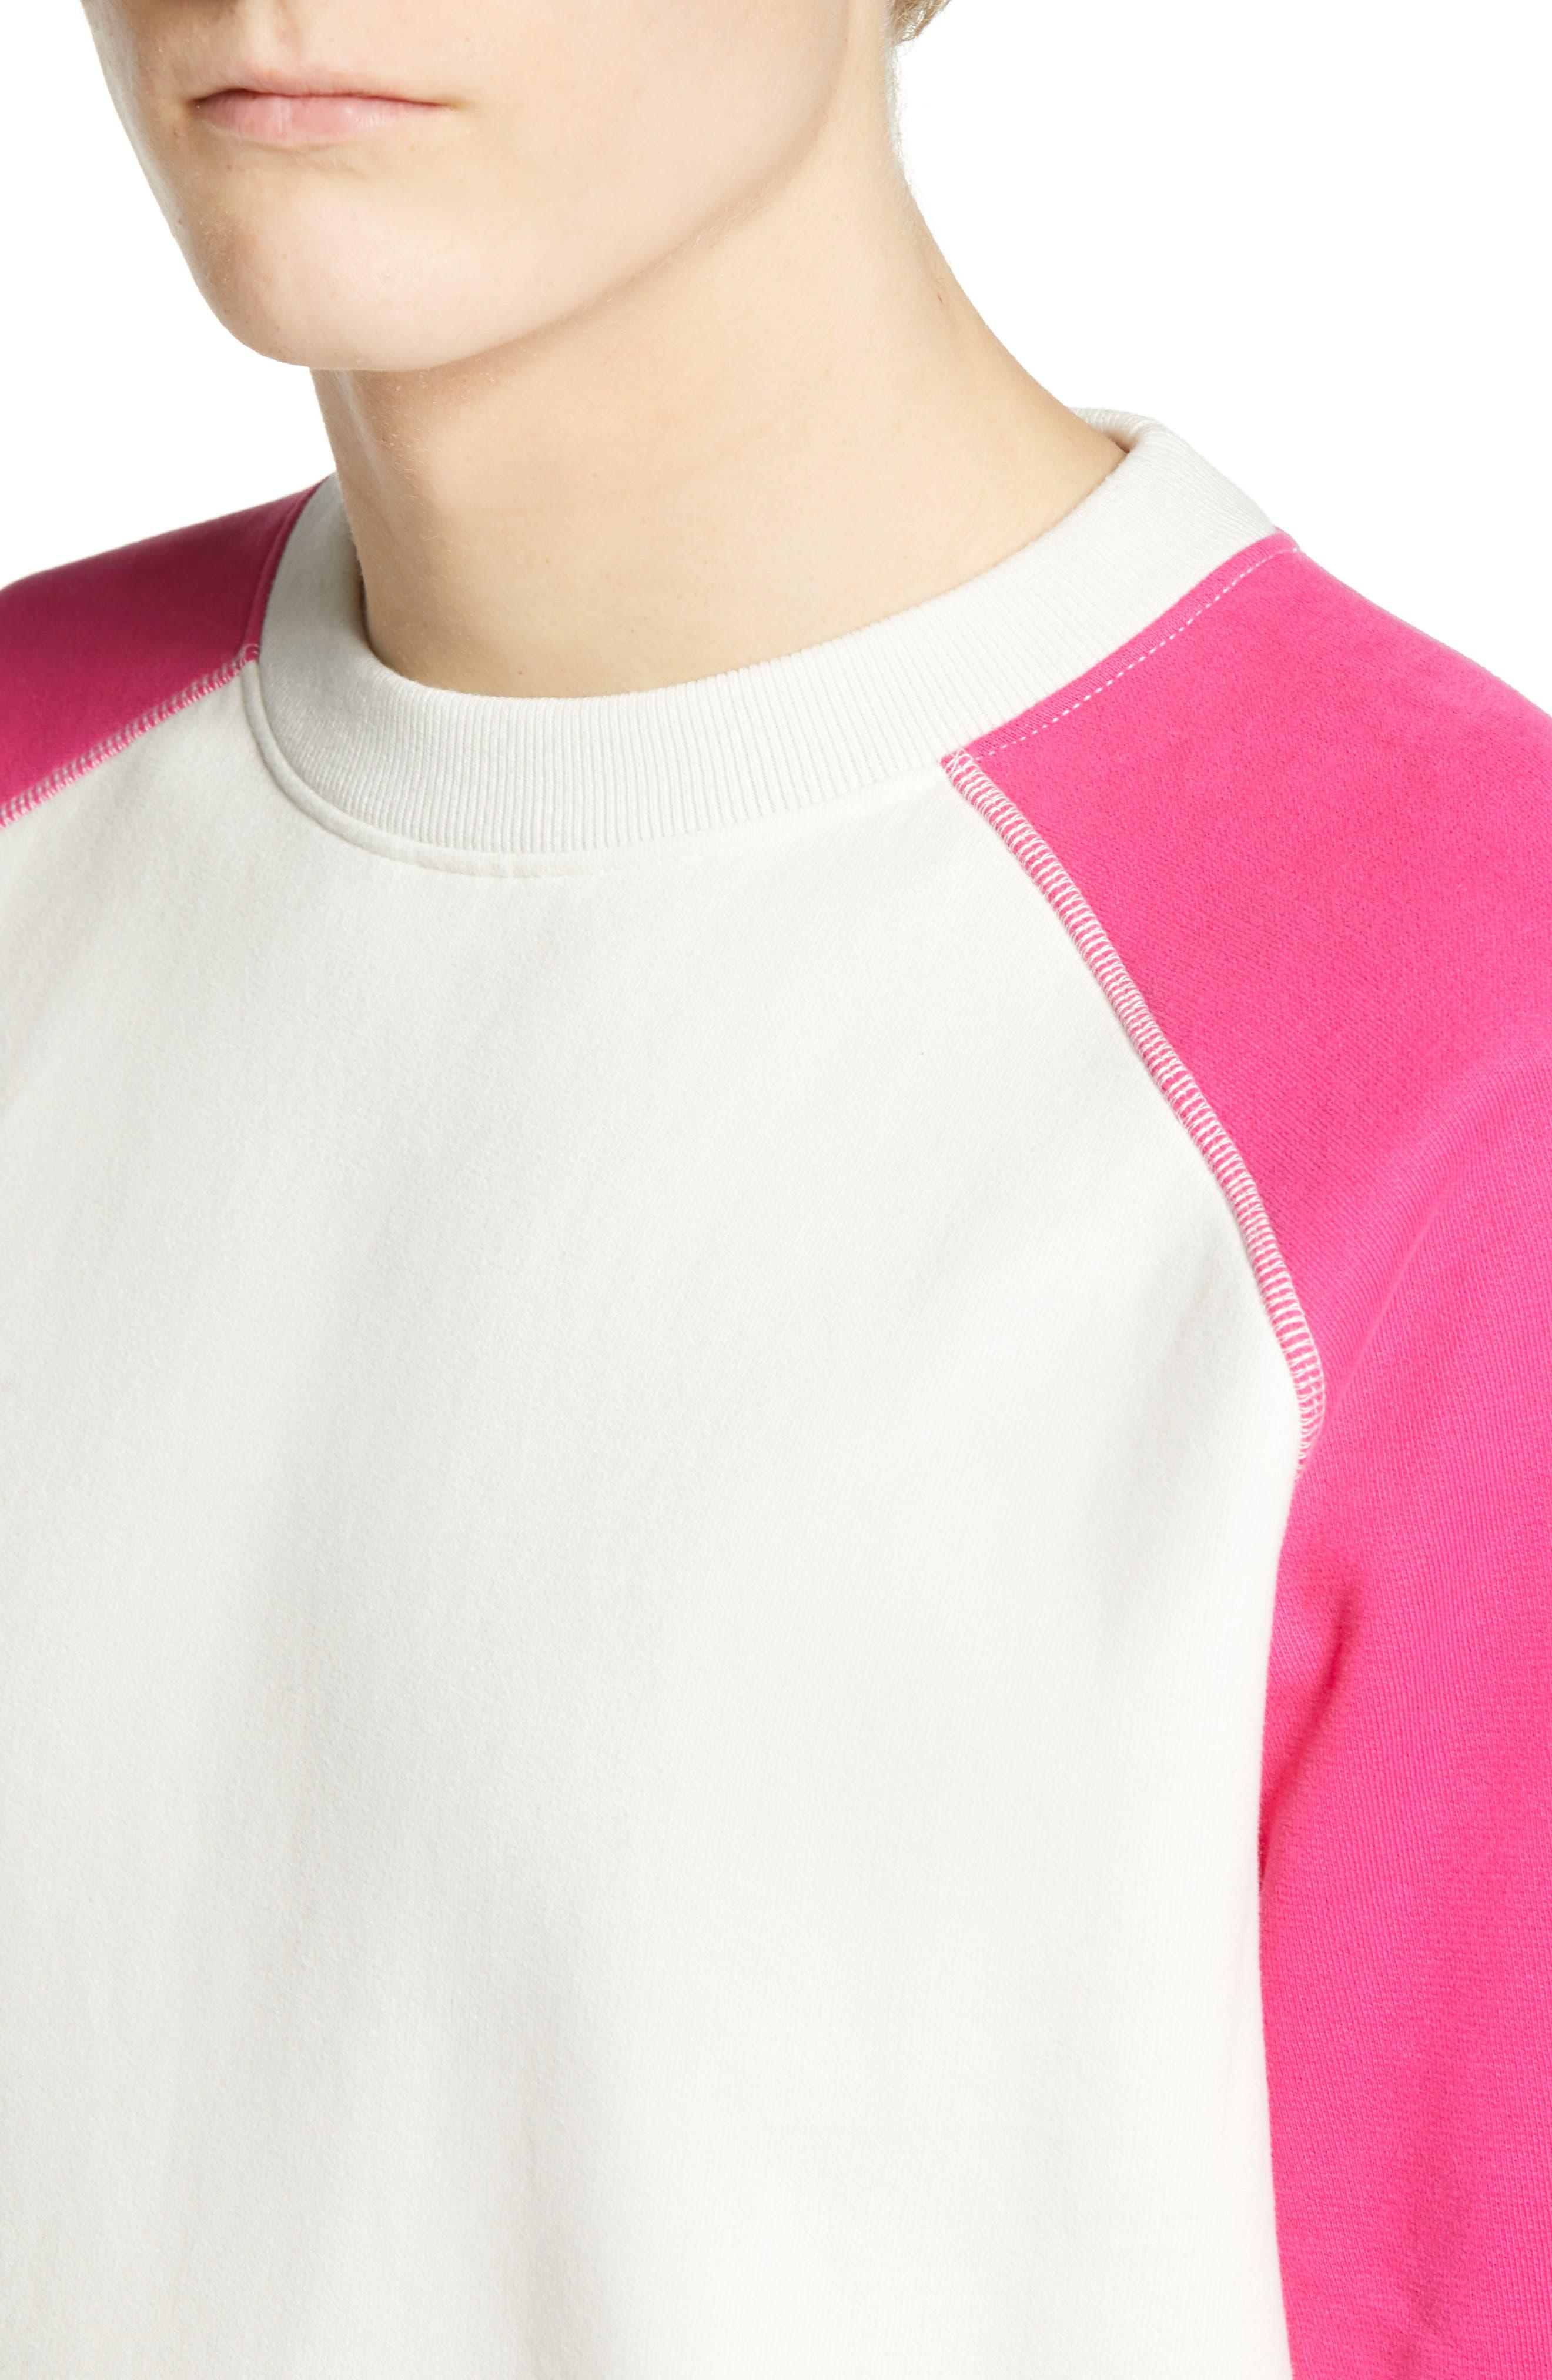 LEVI'S<SUP>®</SUP> MADE & CRAFTED<SUP>™</SUP>, Regular Fit Raglan Sweatshirt, Alternate thumbnail 4, color, WHITE ALYSSUM